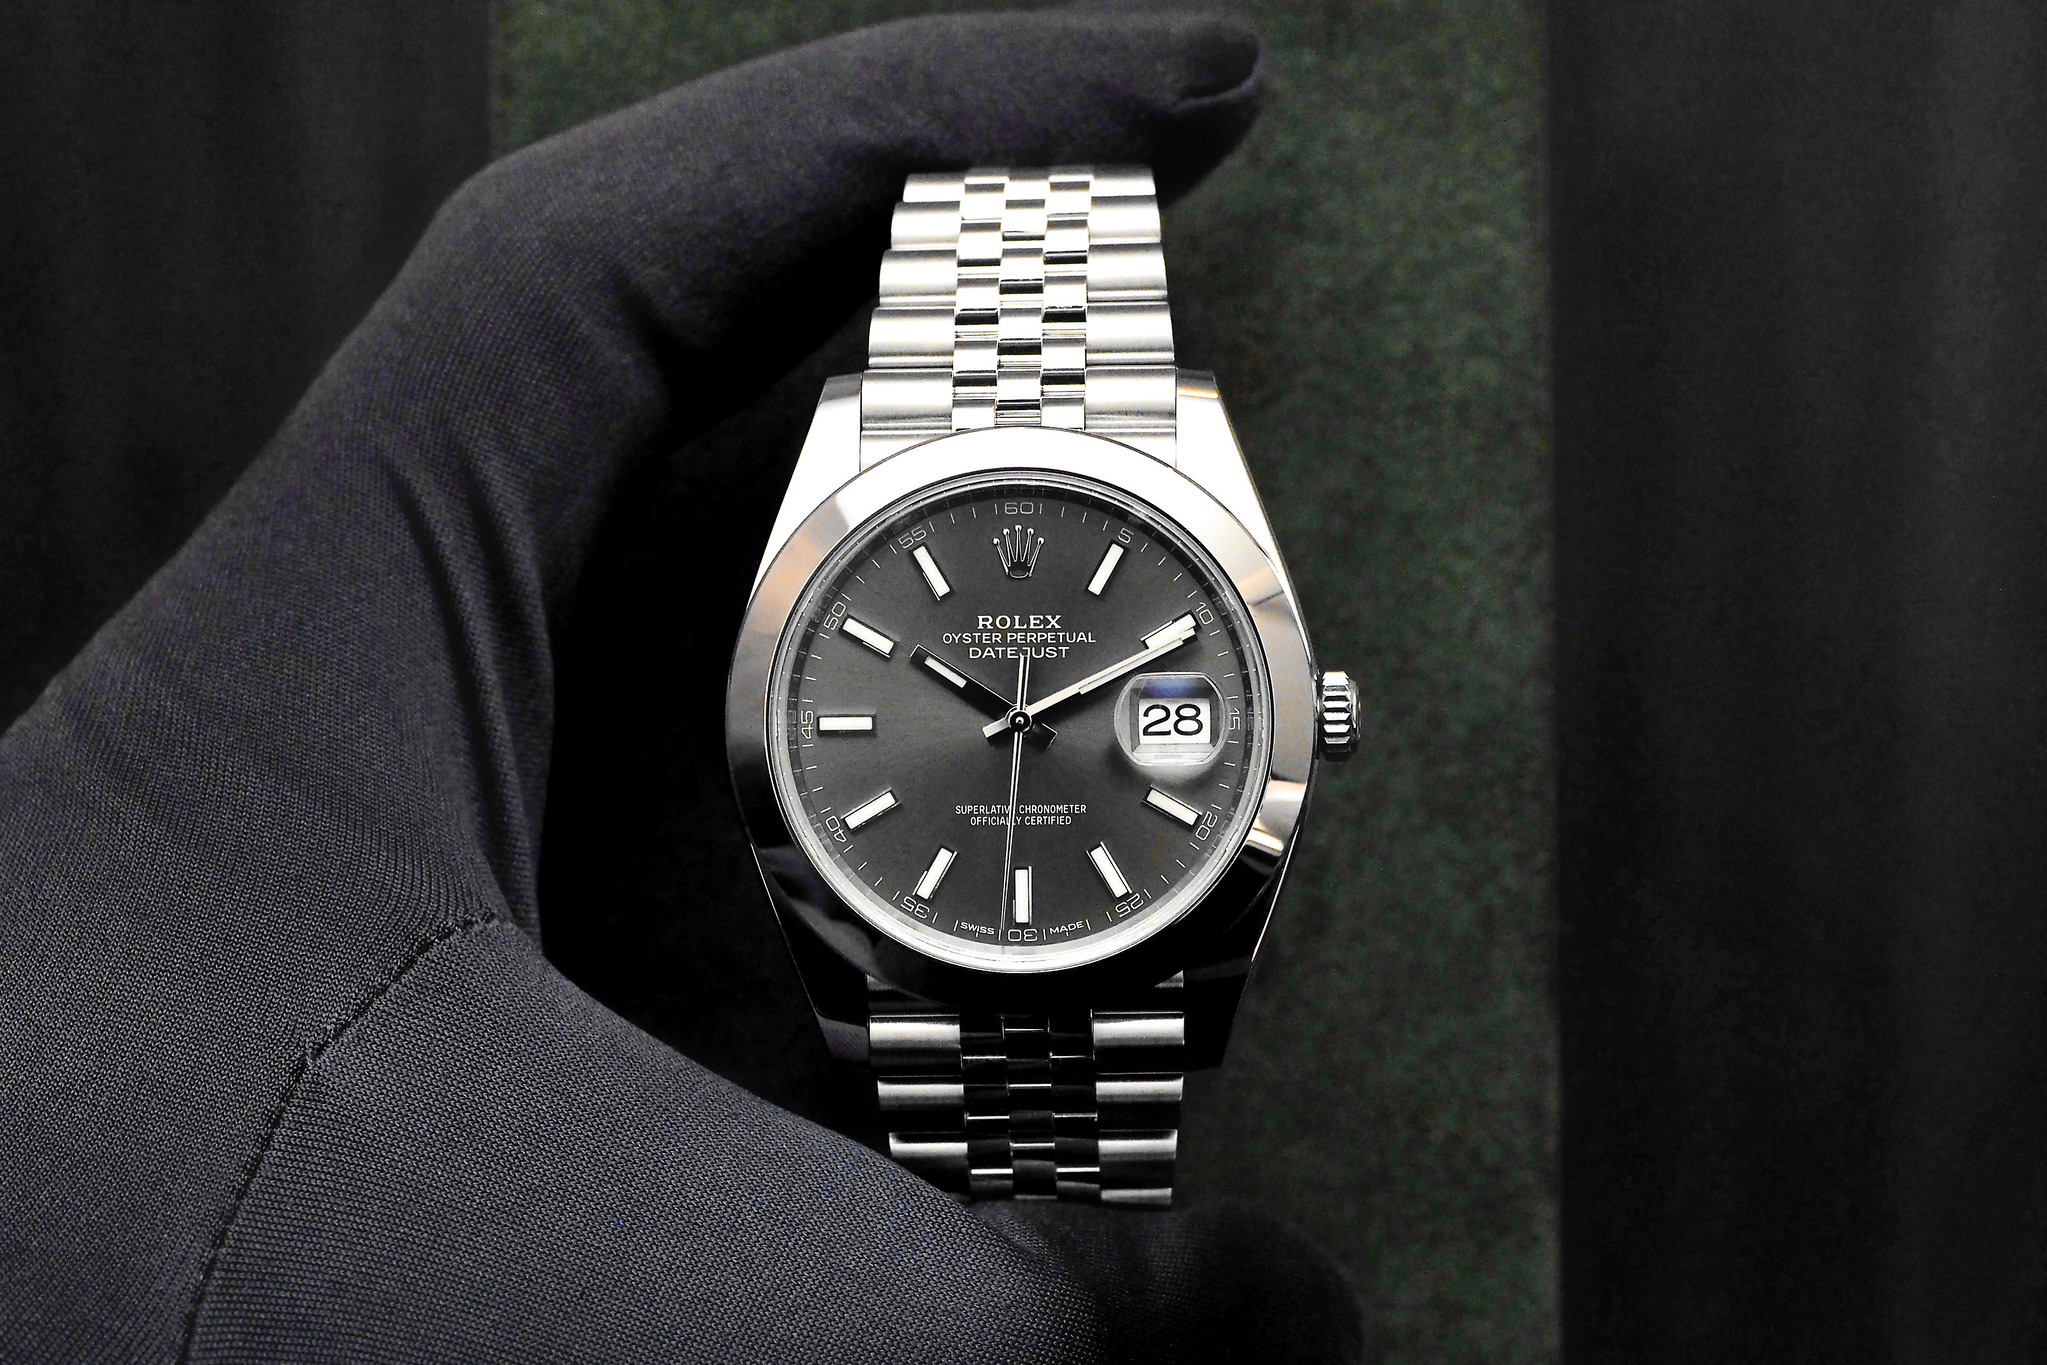 Rolex Datejust 41 in Steel with Dark Rhodium dial and